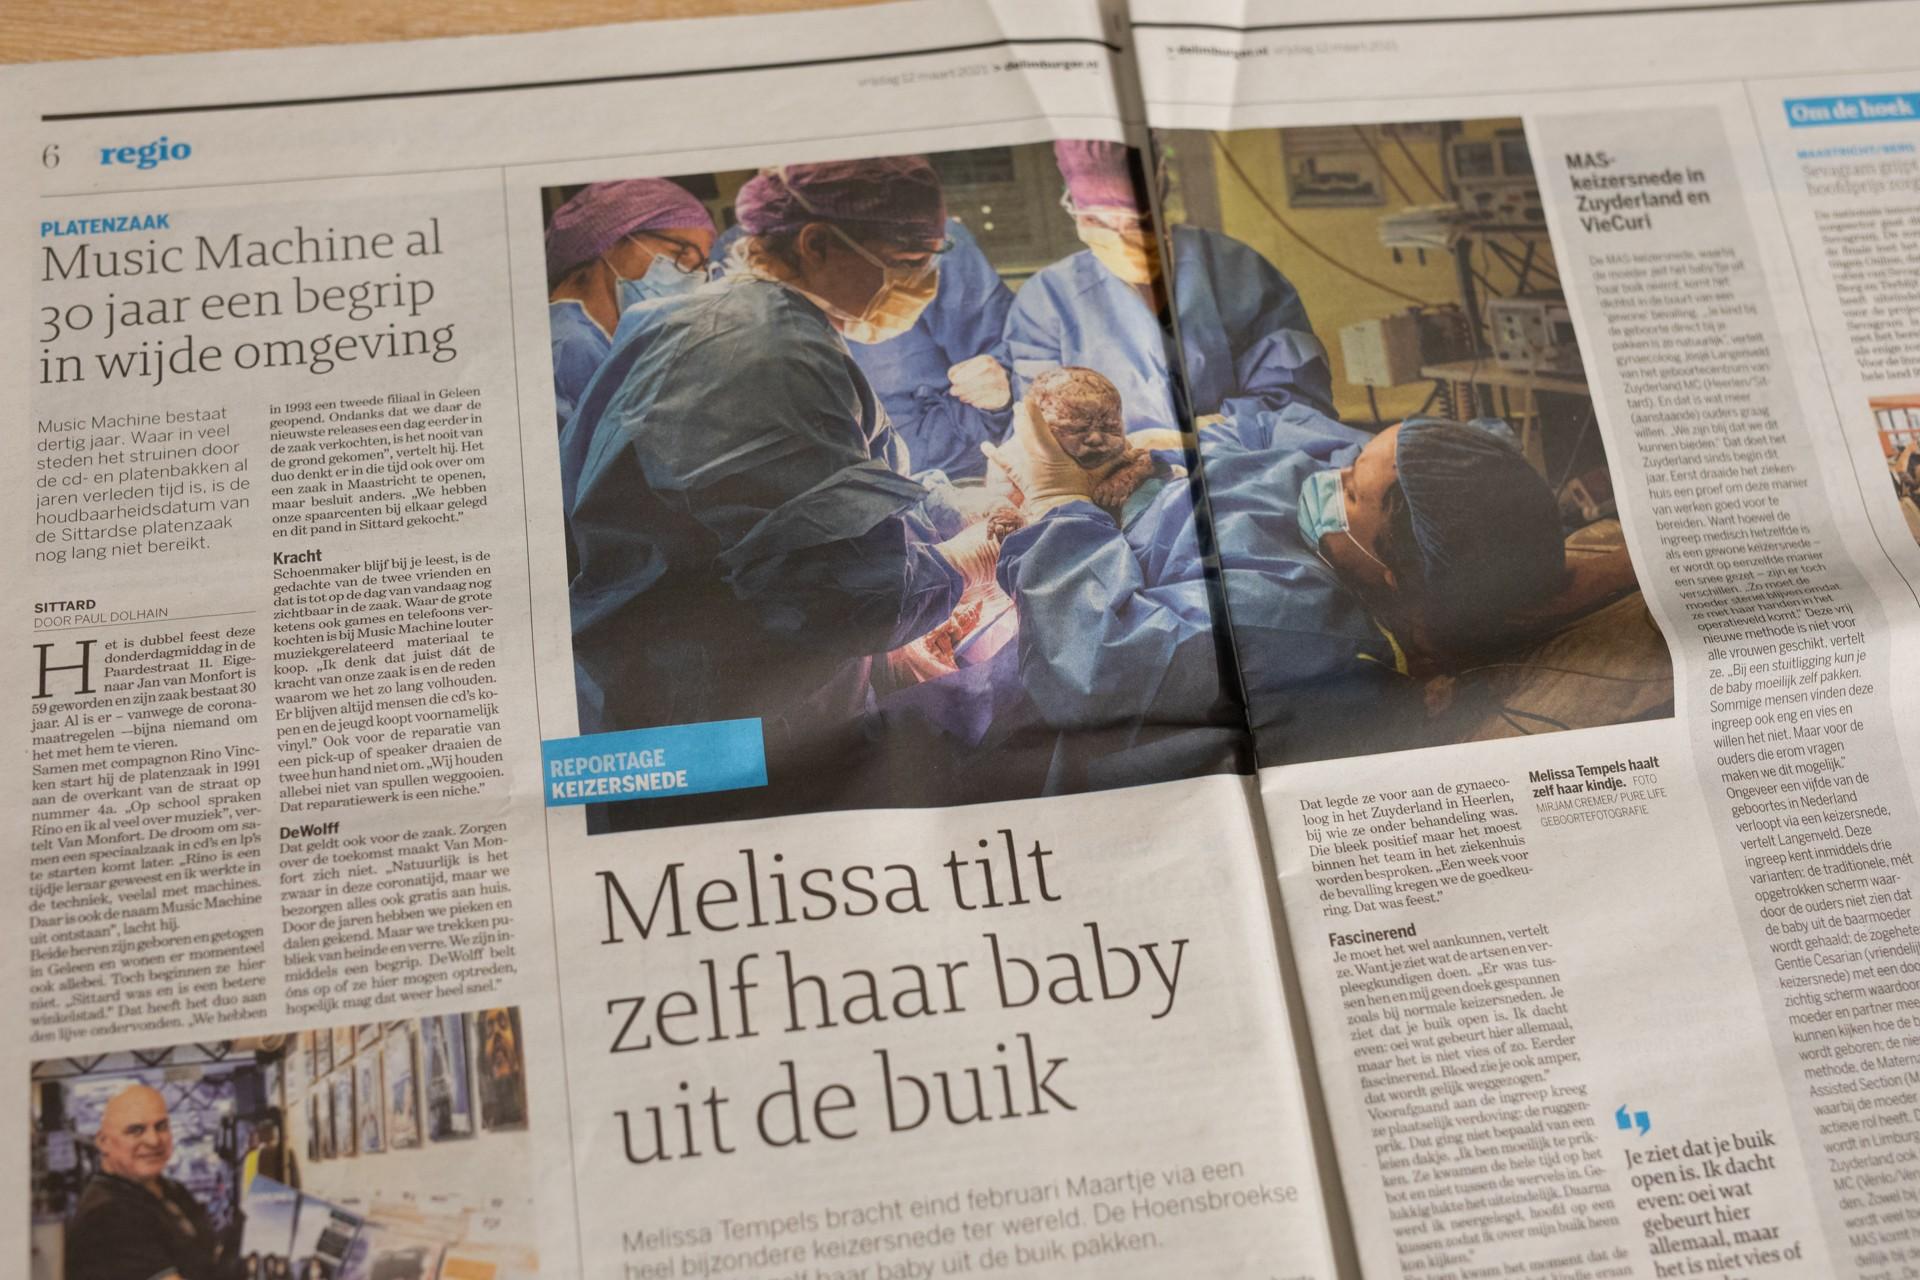 media-pure-life-geboortefotografie-geboorte-geboortefotografie